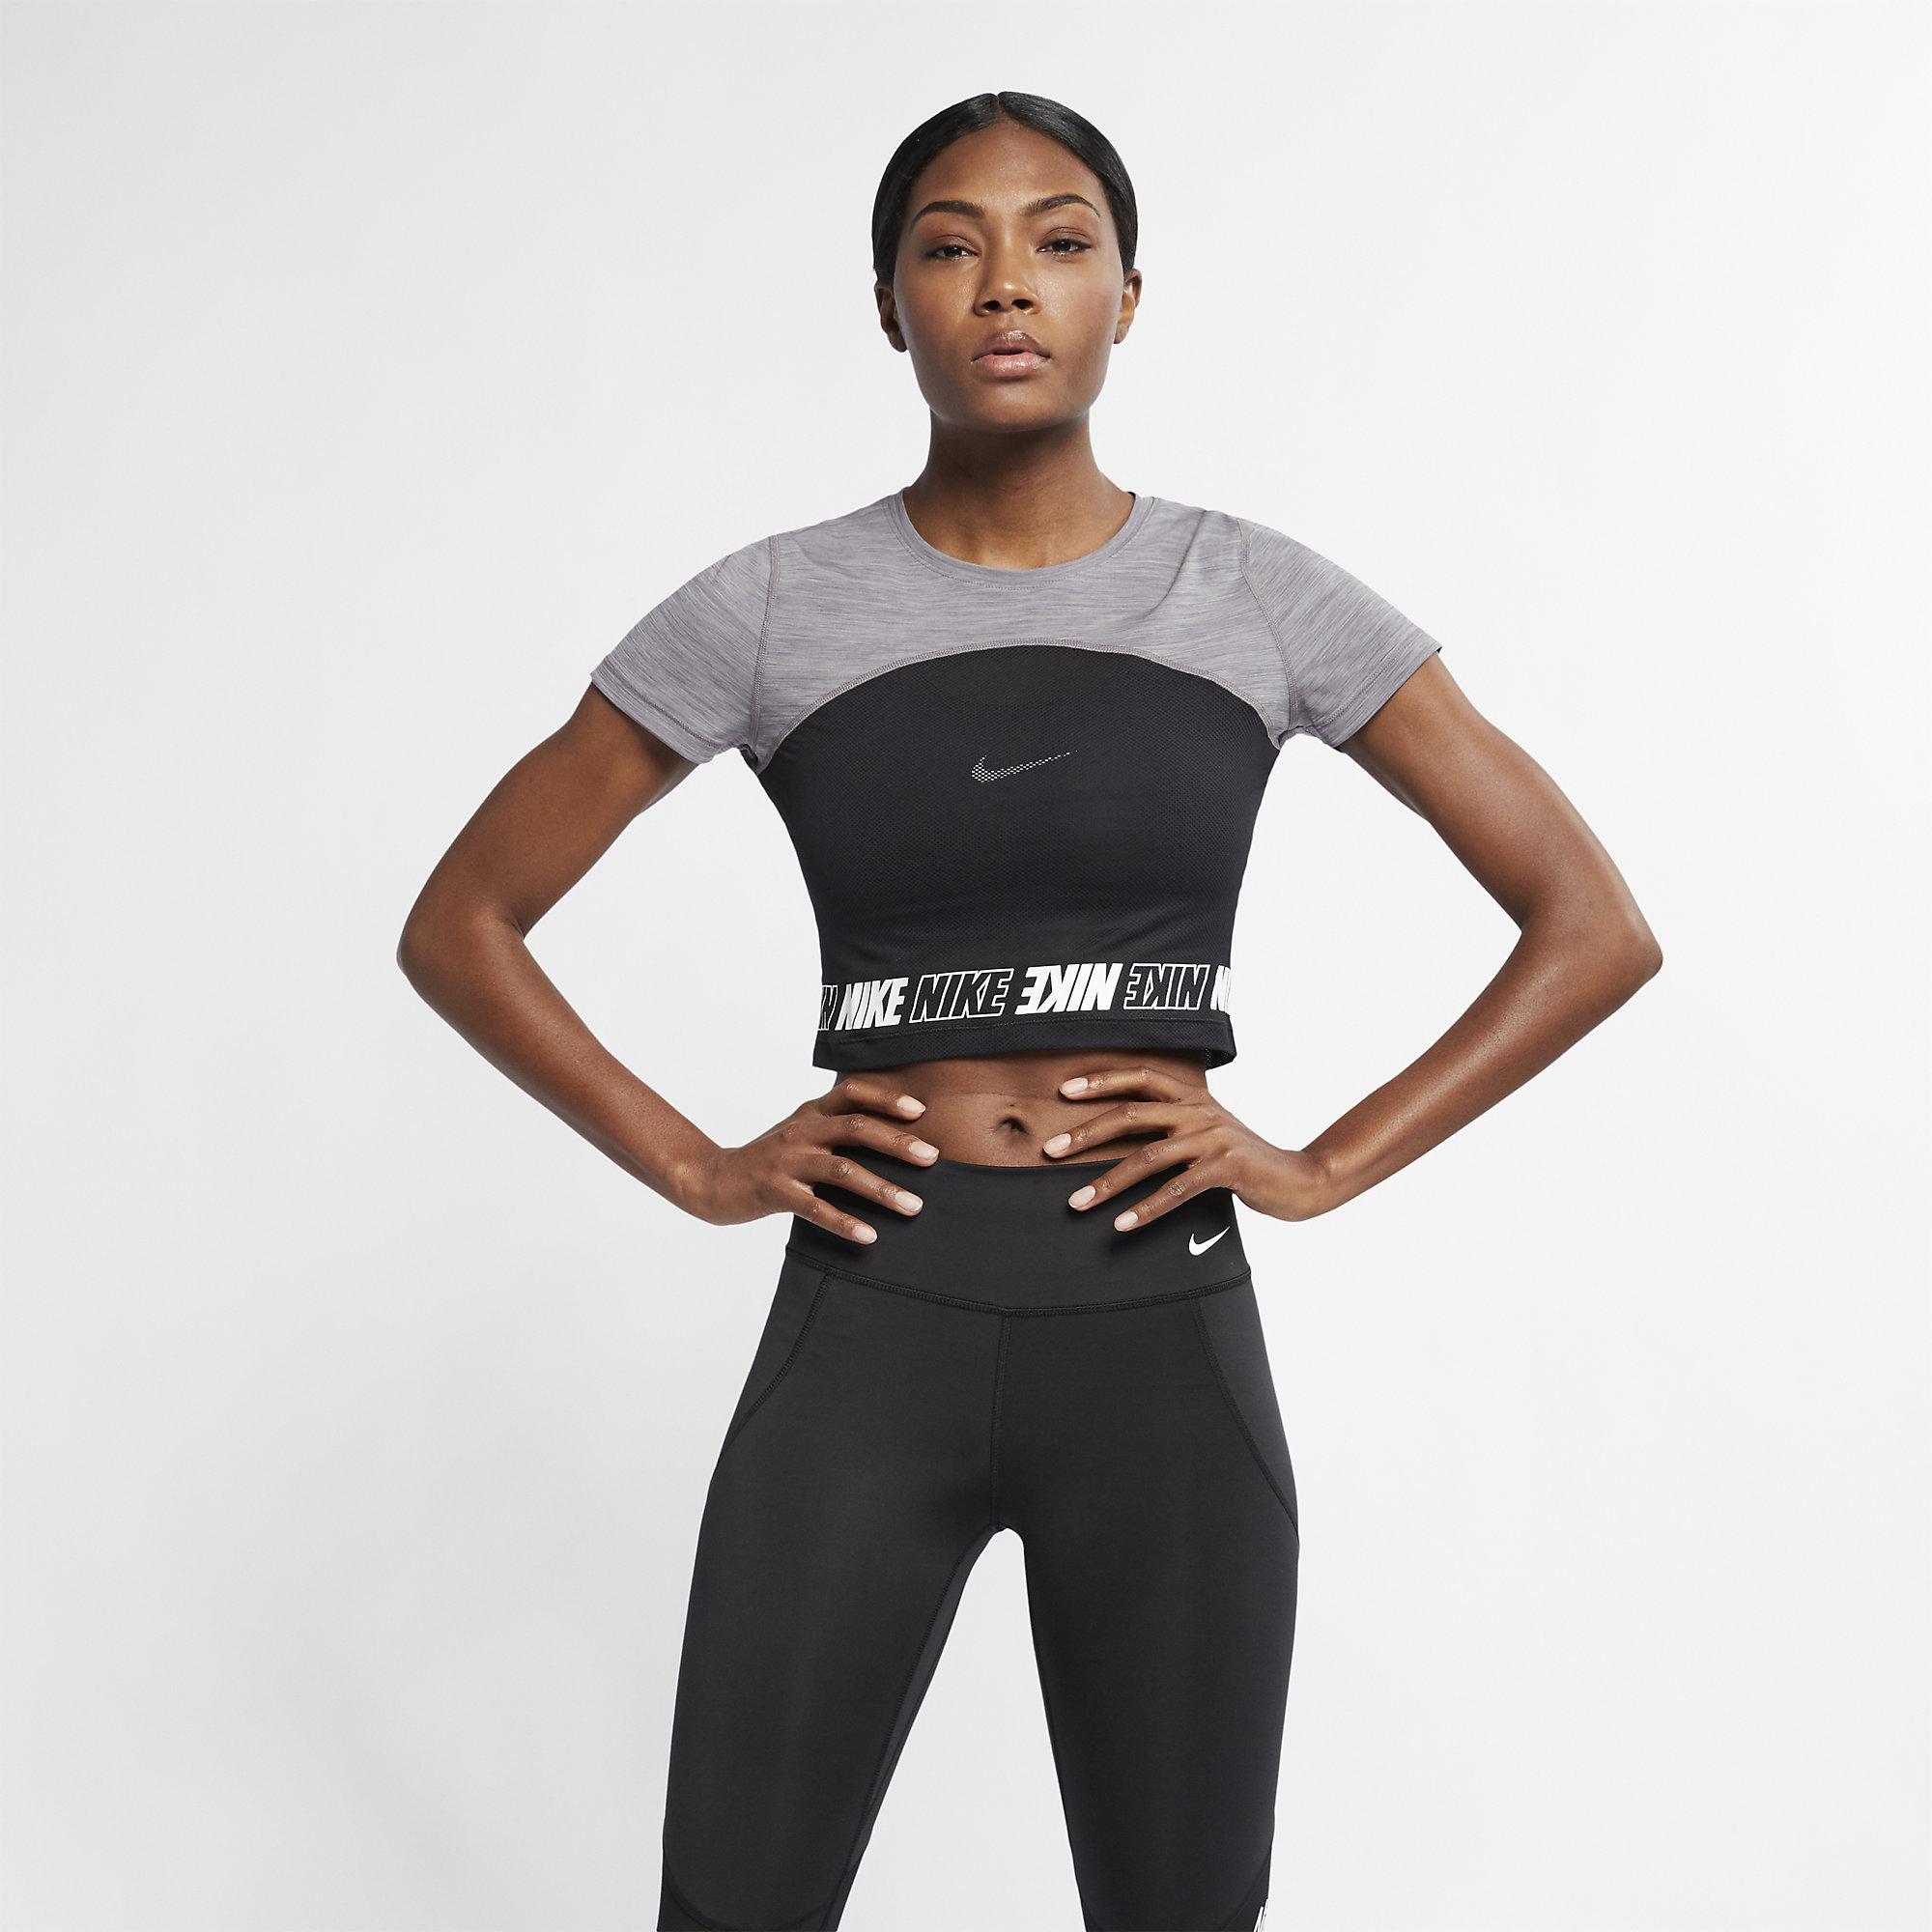 d2e5b0c242c3f Nike Womens Pro Short-Sleeve Crop Top- Gunsmoke Heather White -  Tennisnuts.com